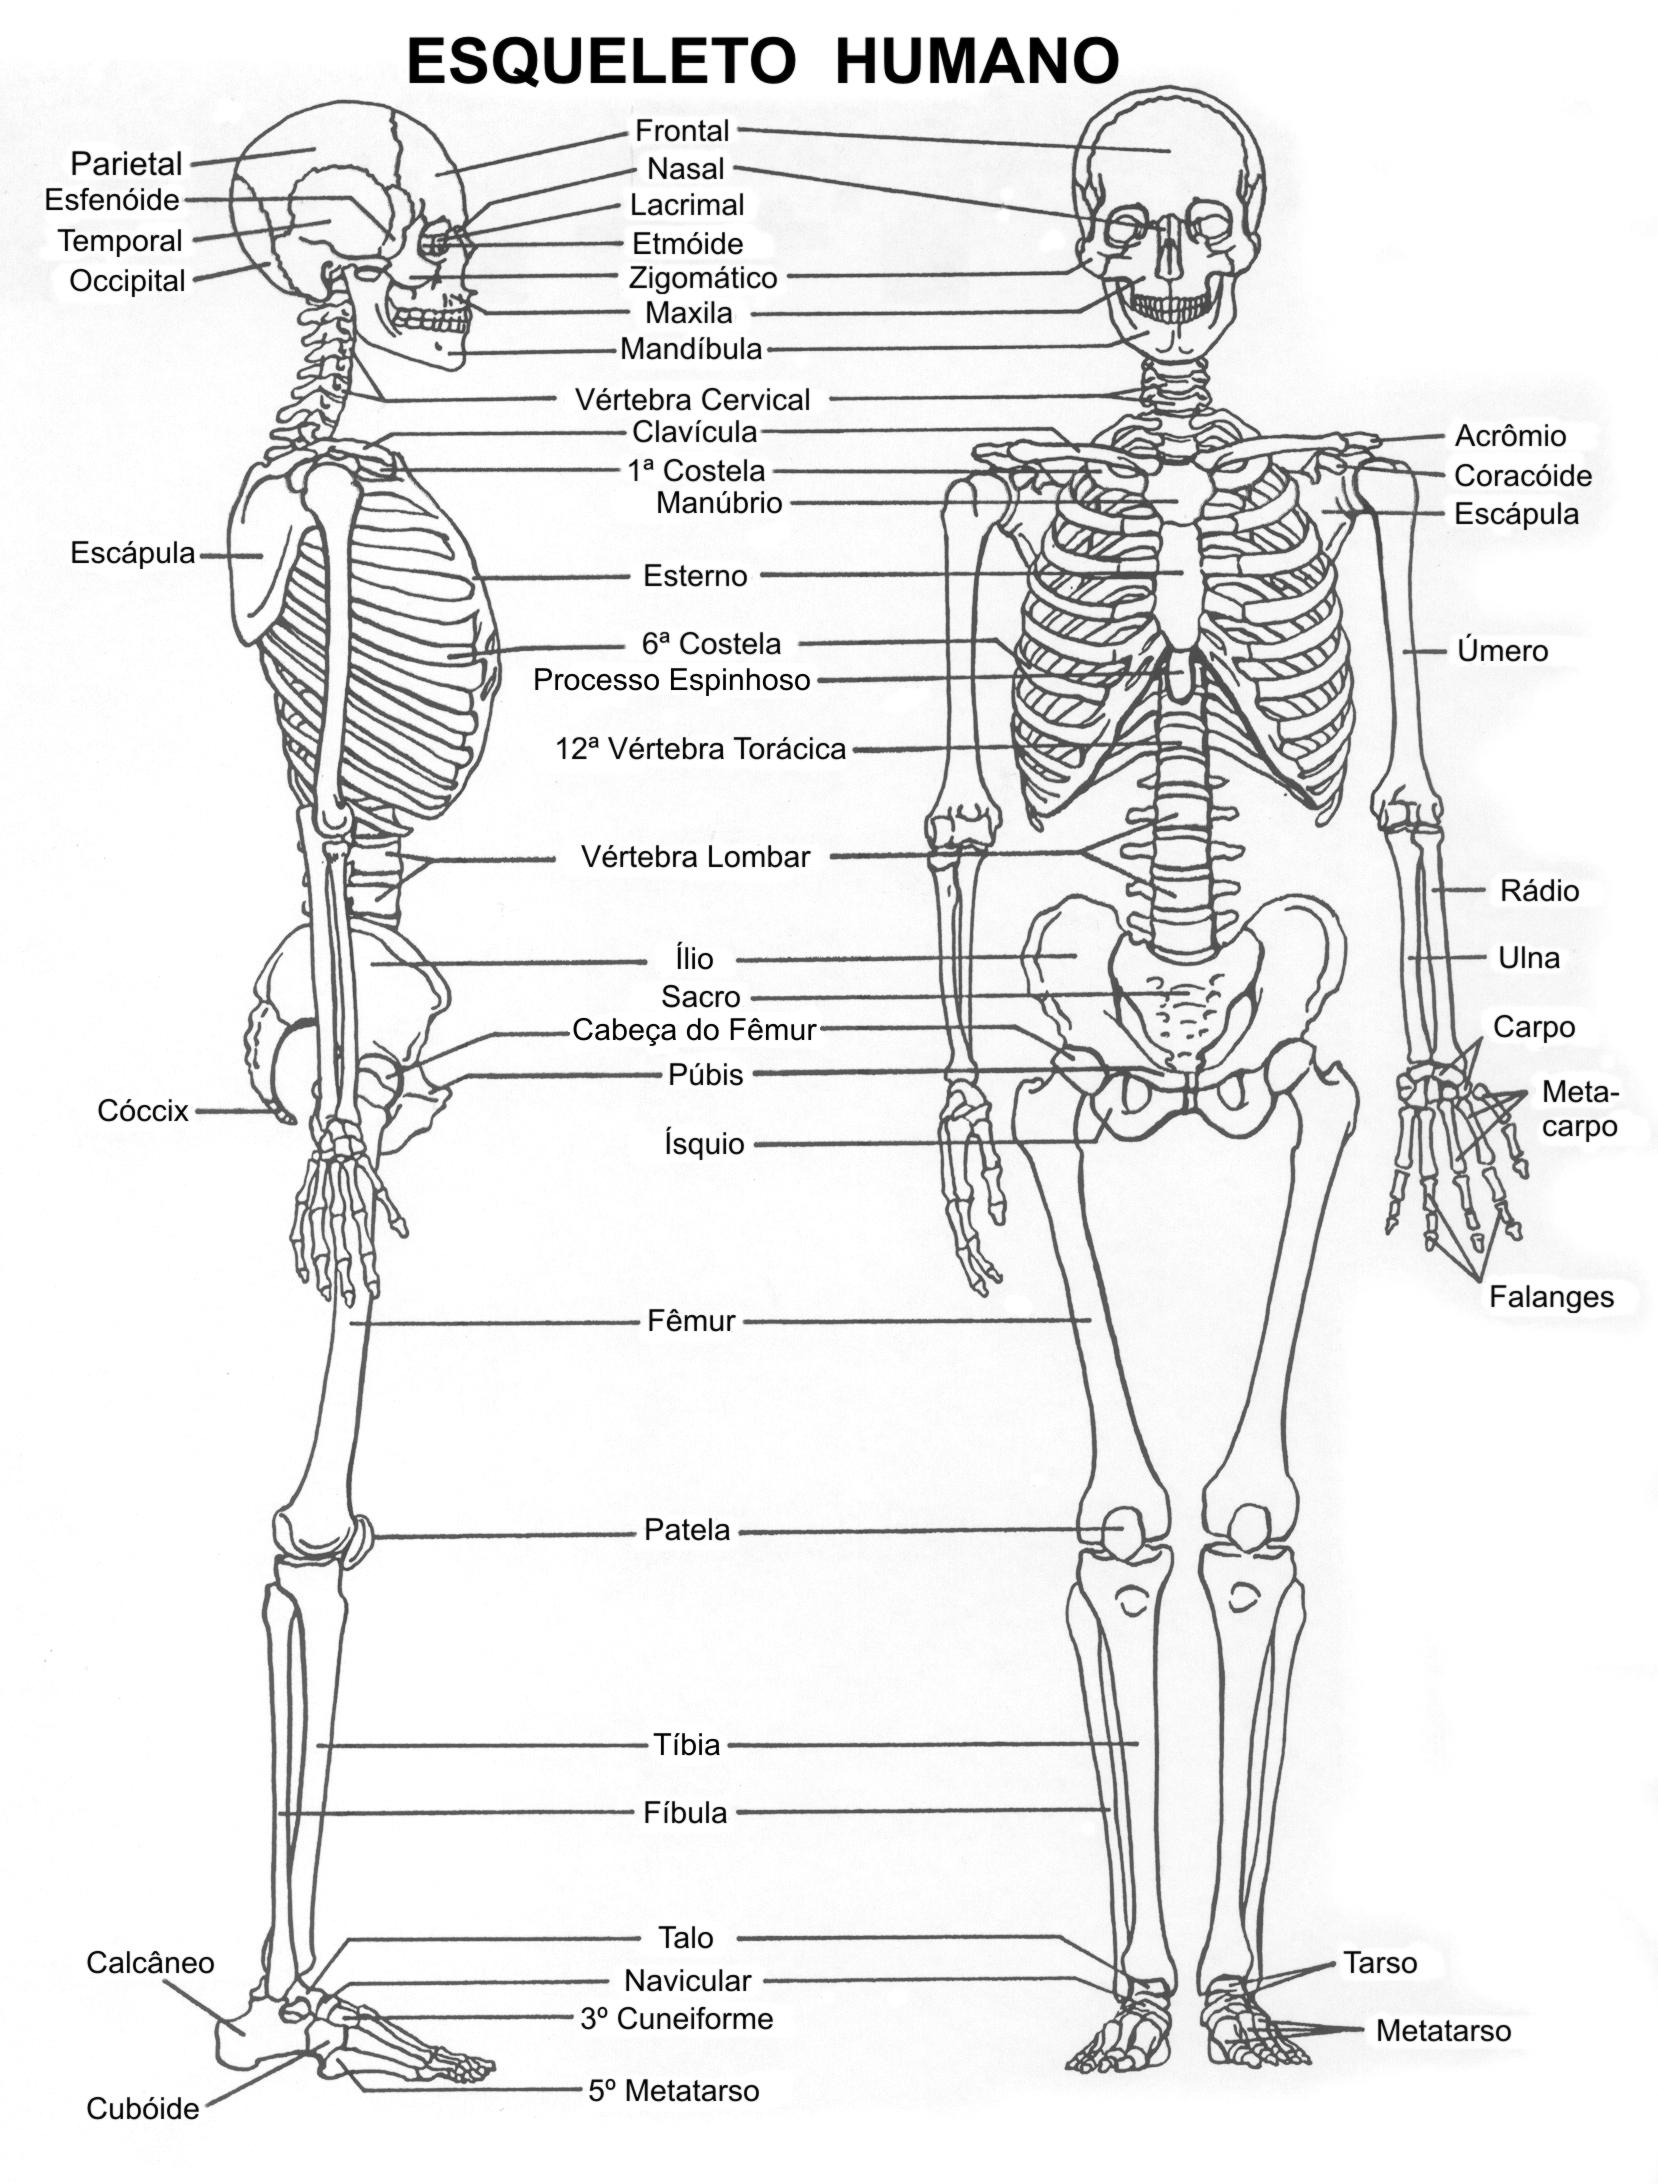 esqueleto | El blog de la profe